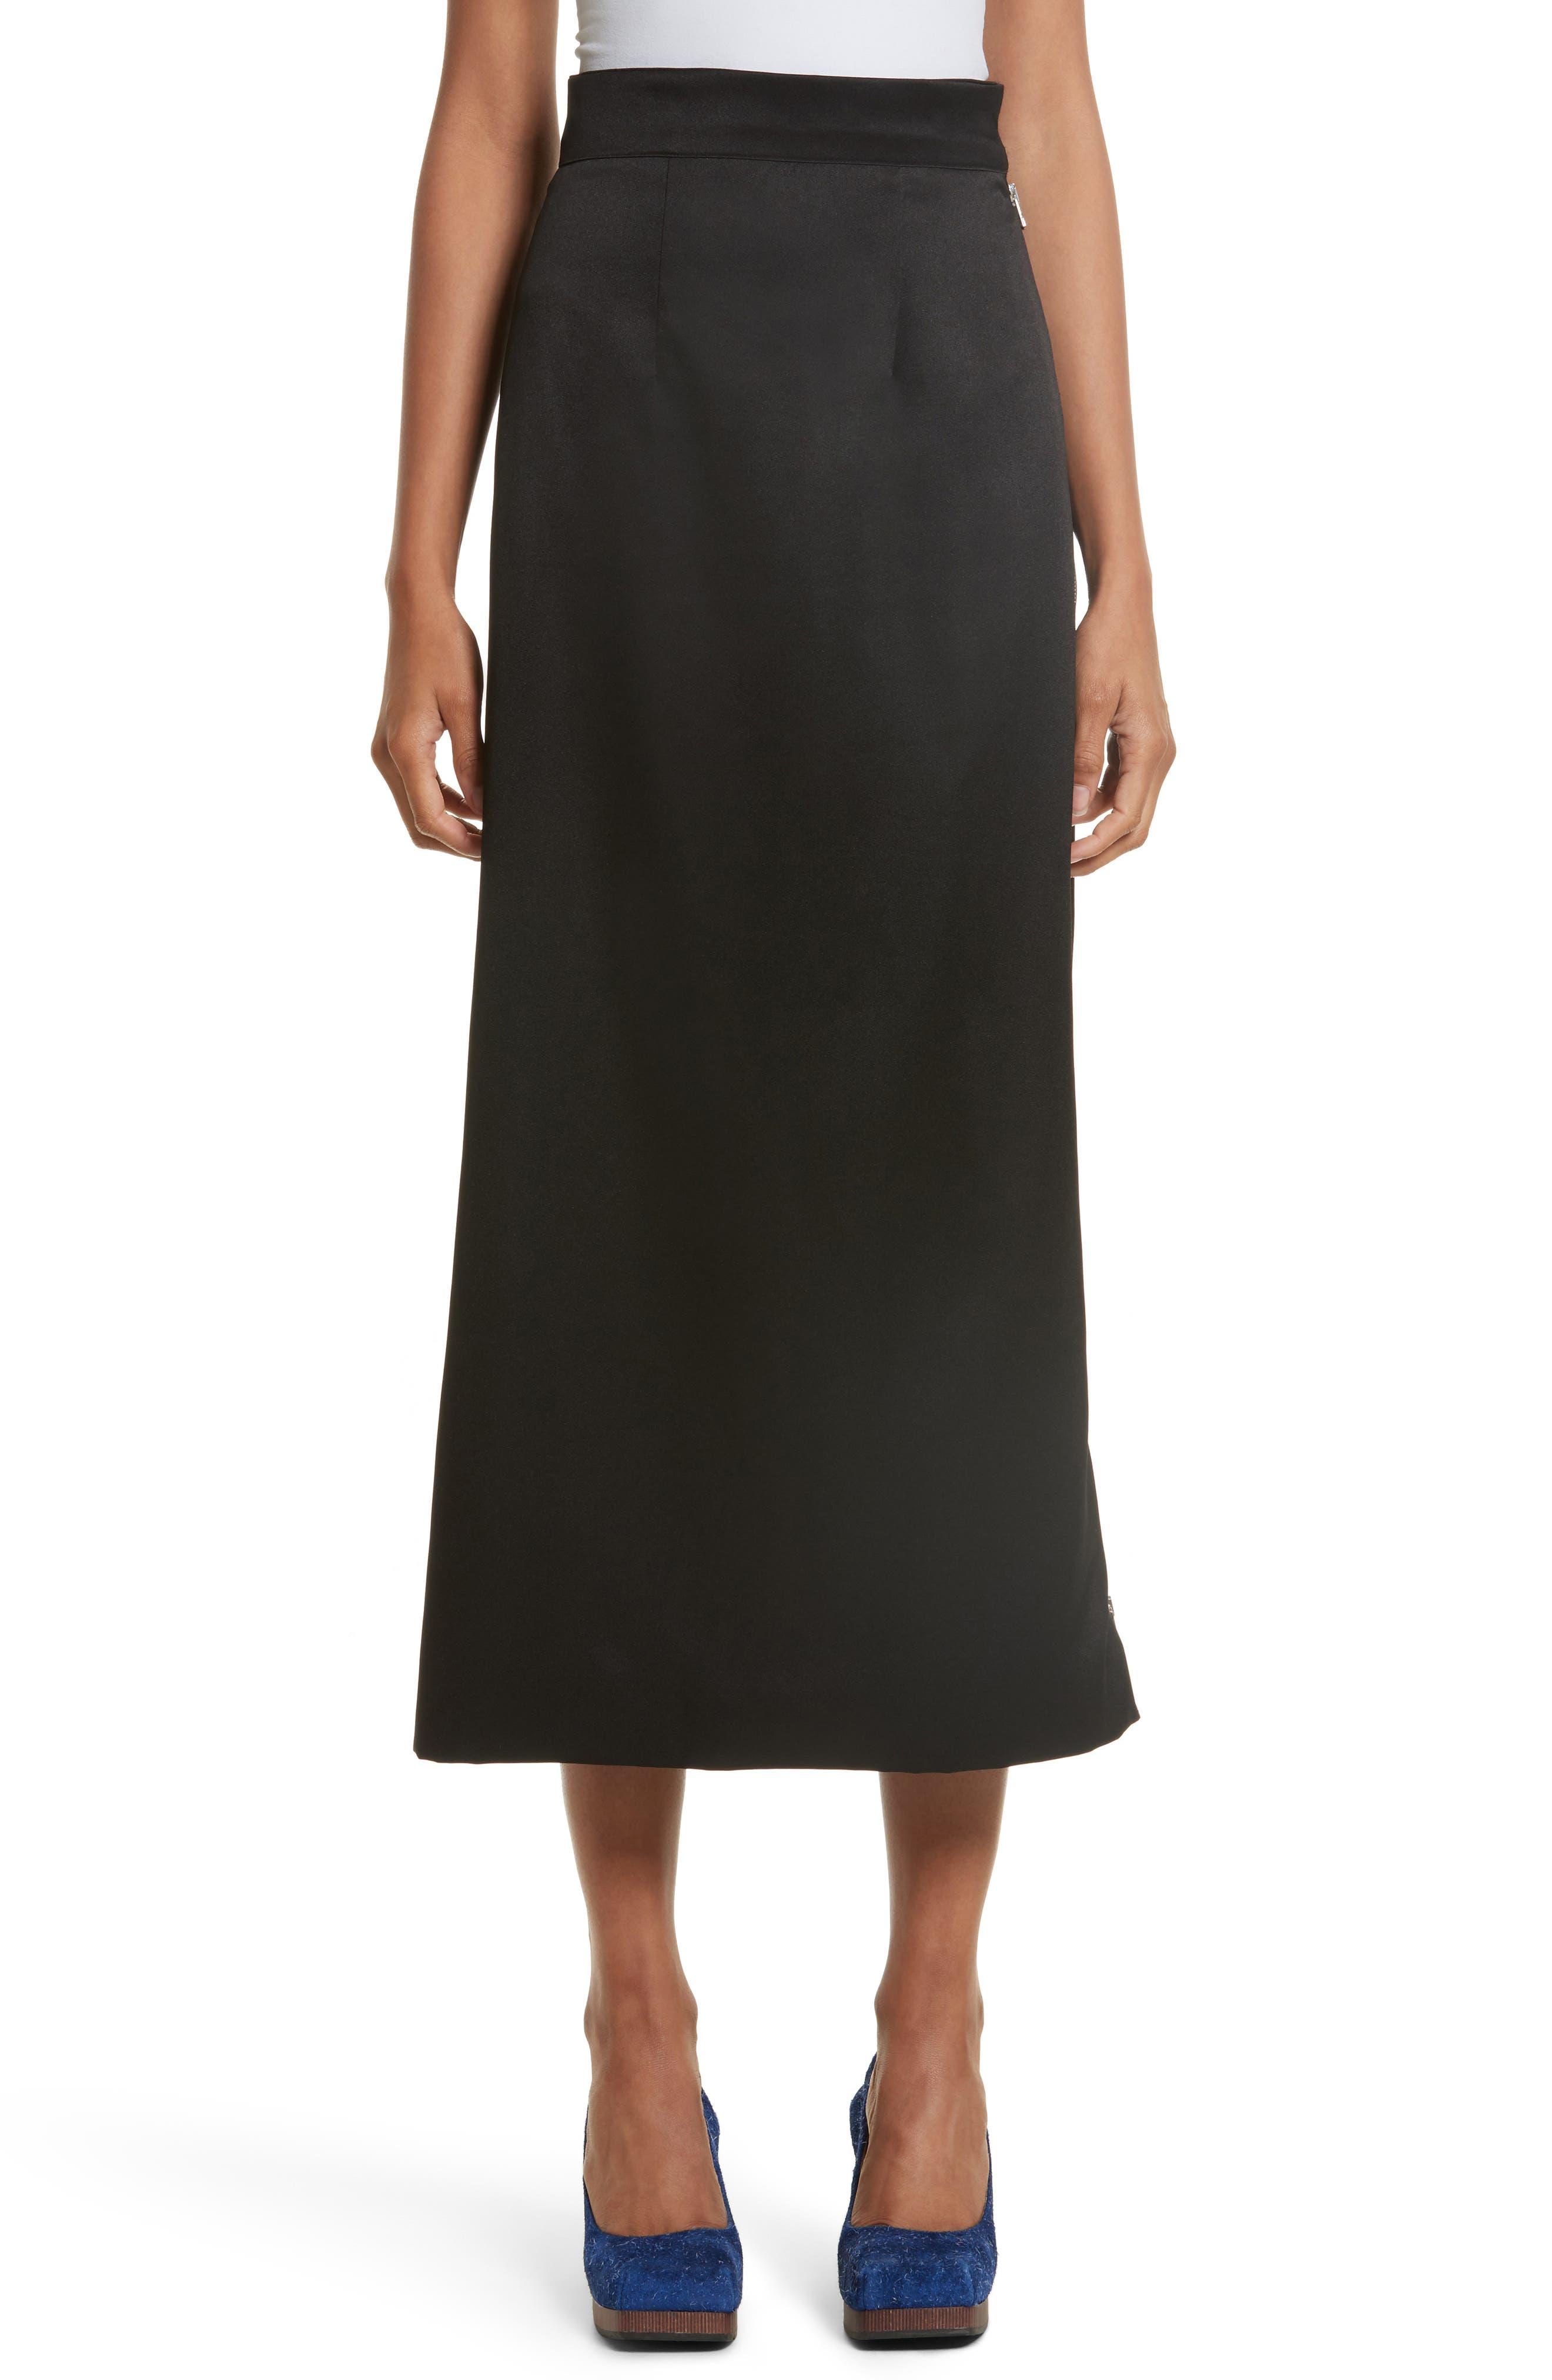 Eckhaus Latta Side Zip Midi Skirt